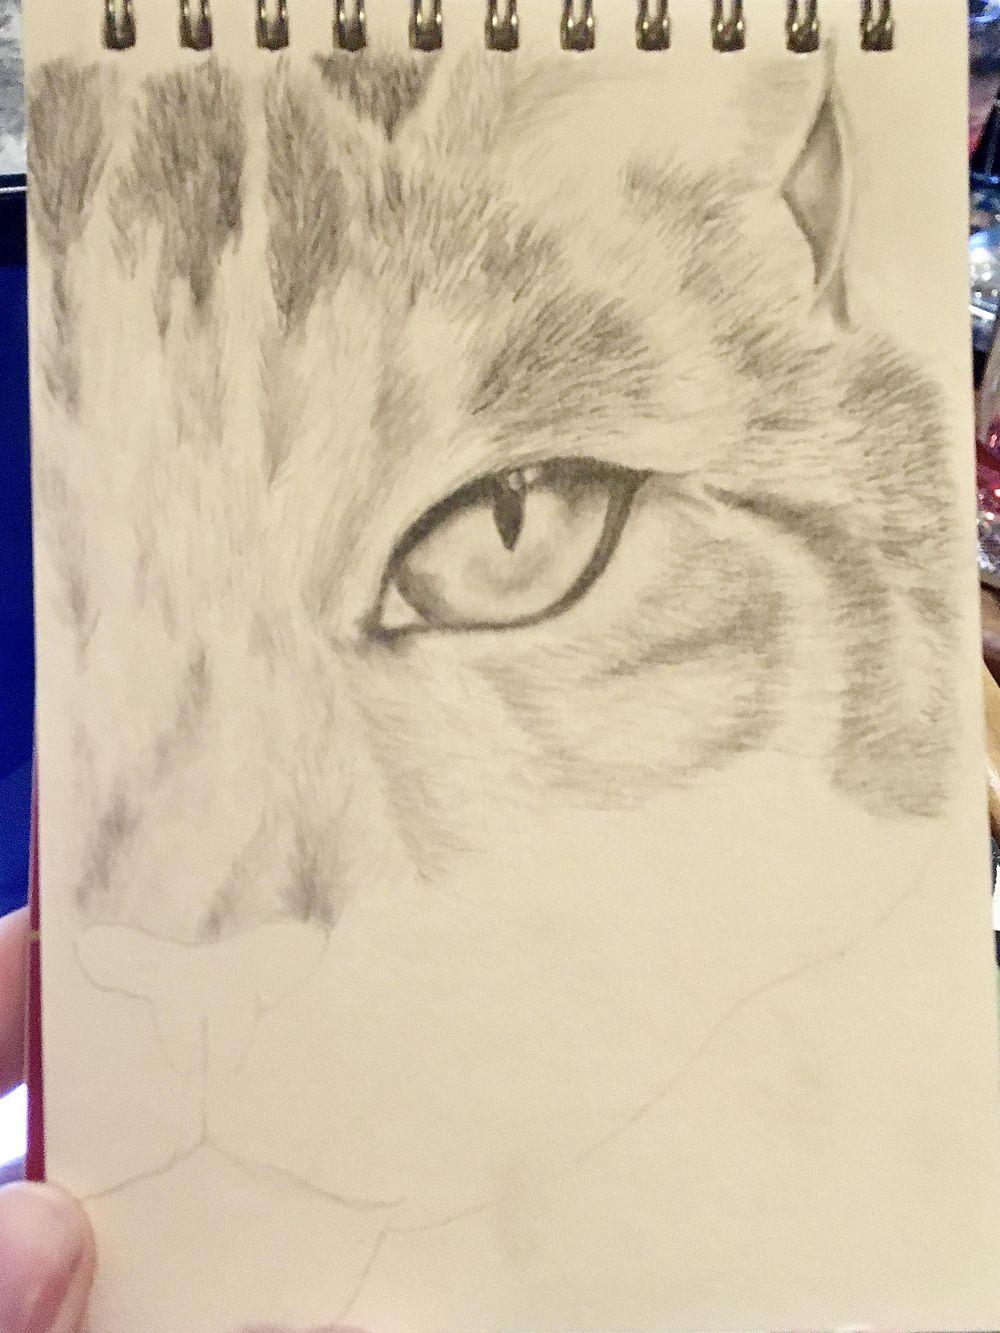 Kitten - image 3 - student project